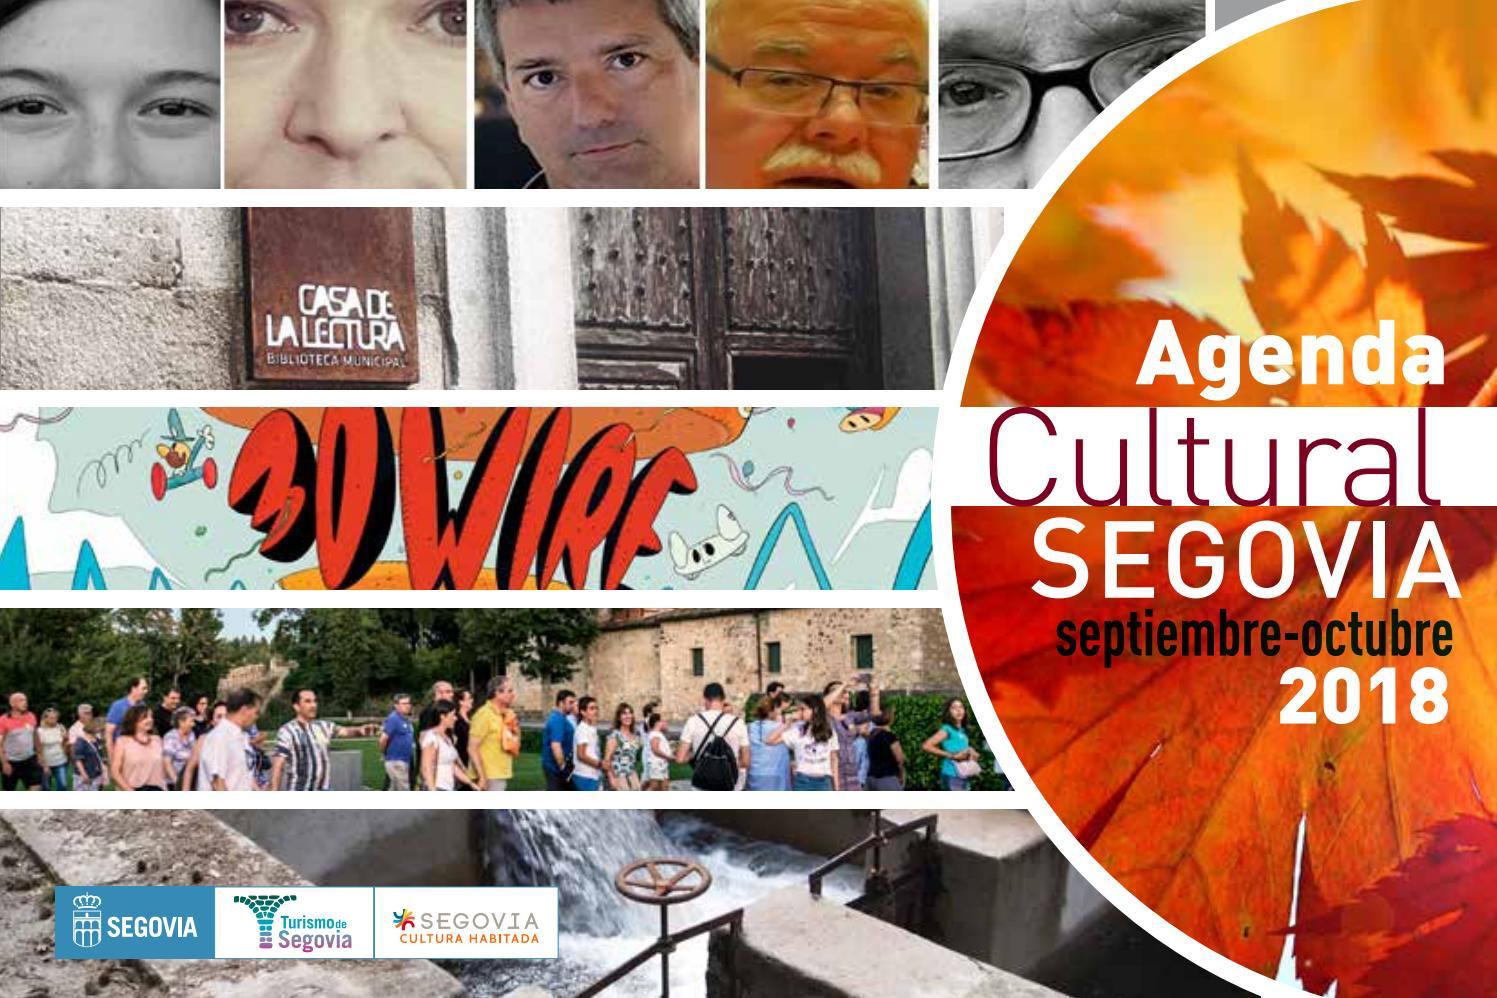 Agenda cultural de Segovia. Septiembre-octubre de 2018 by Segovia ...